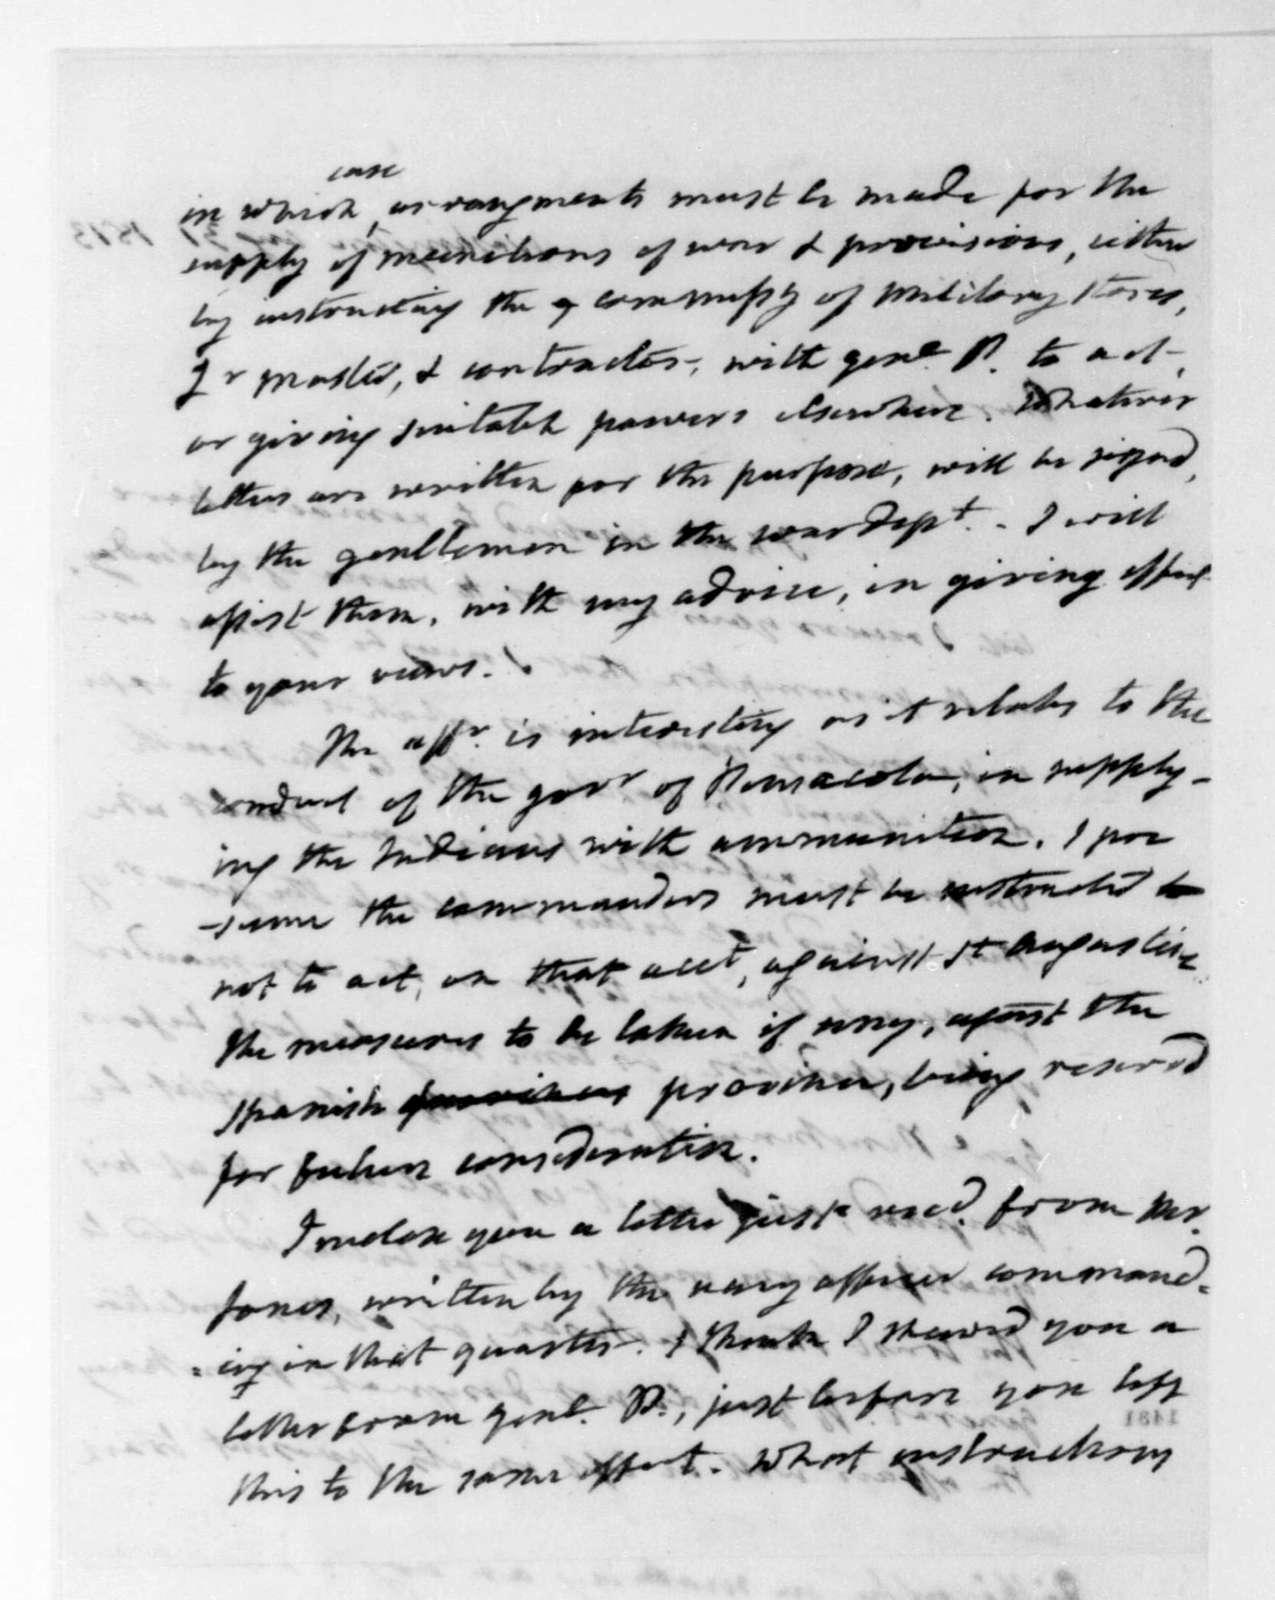 James Monroe to James Madison, August 31, 1813.